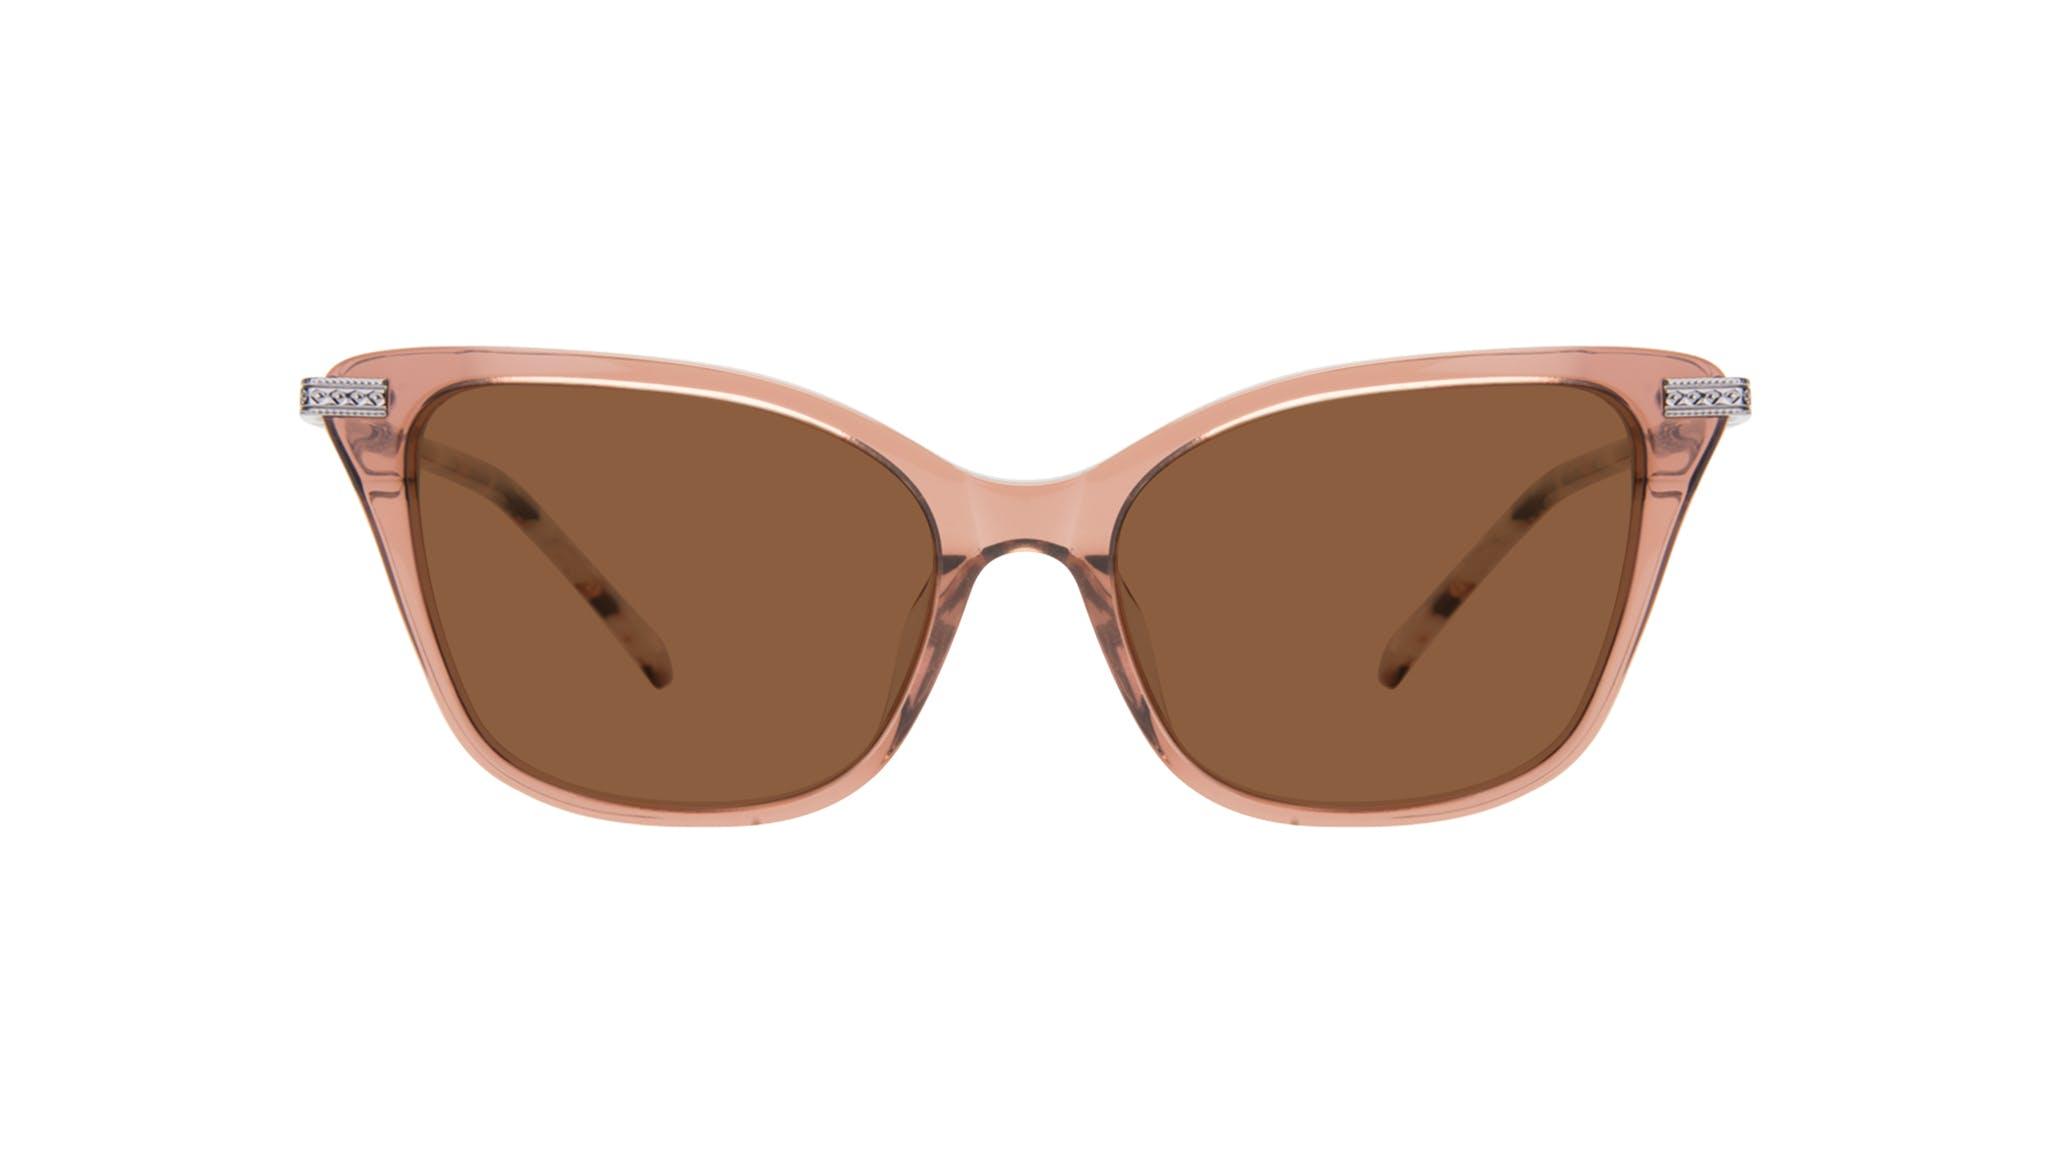 Affordable Fashion Glasses Cat Eye Sunglasses Women Stargaze Truffle Rose Front